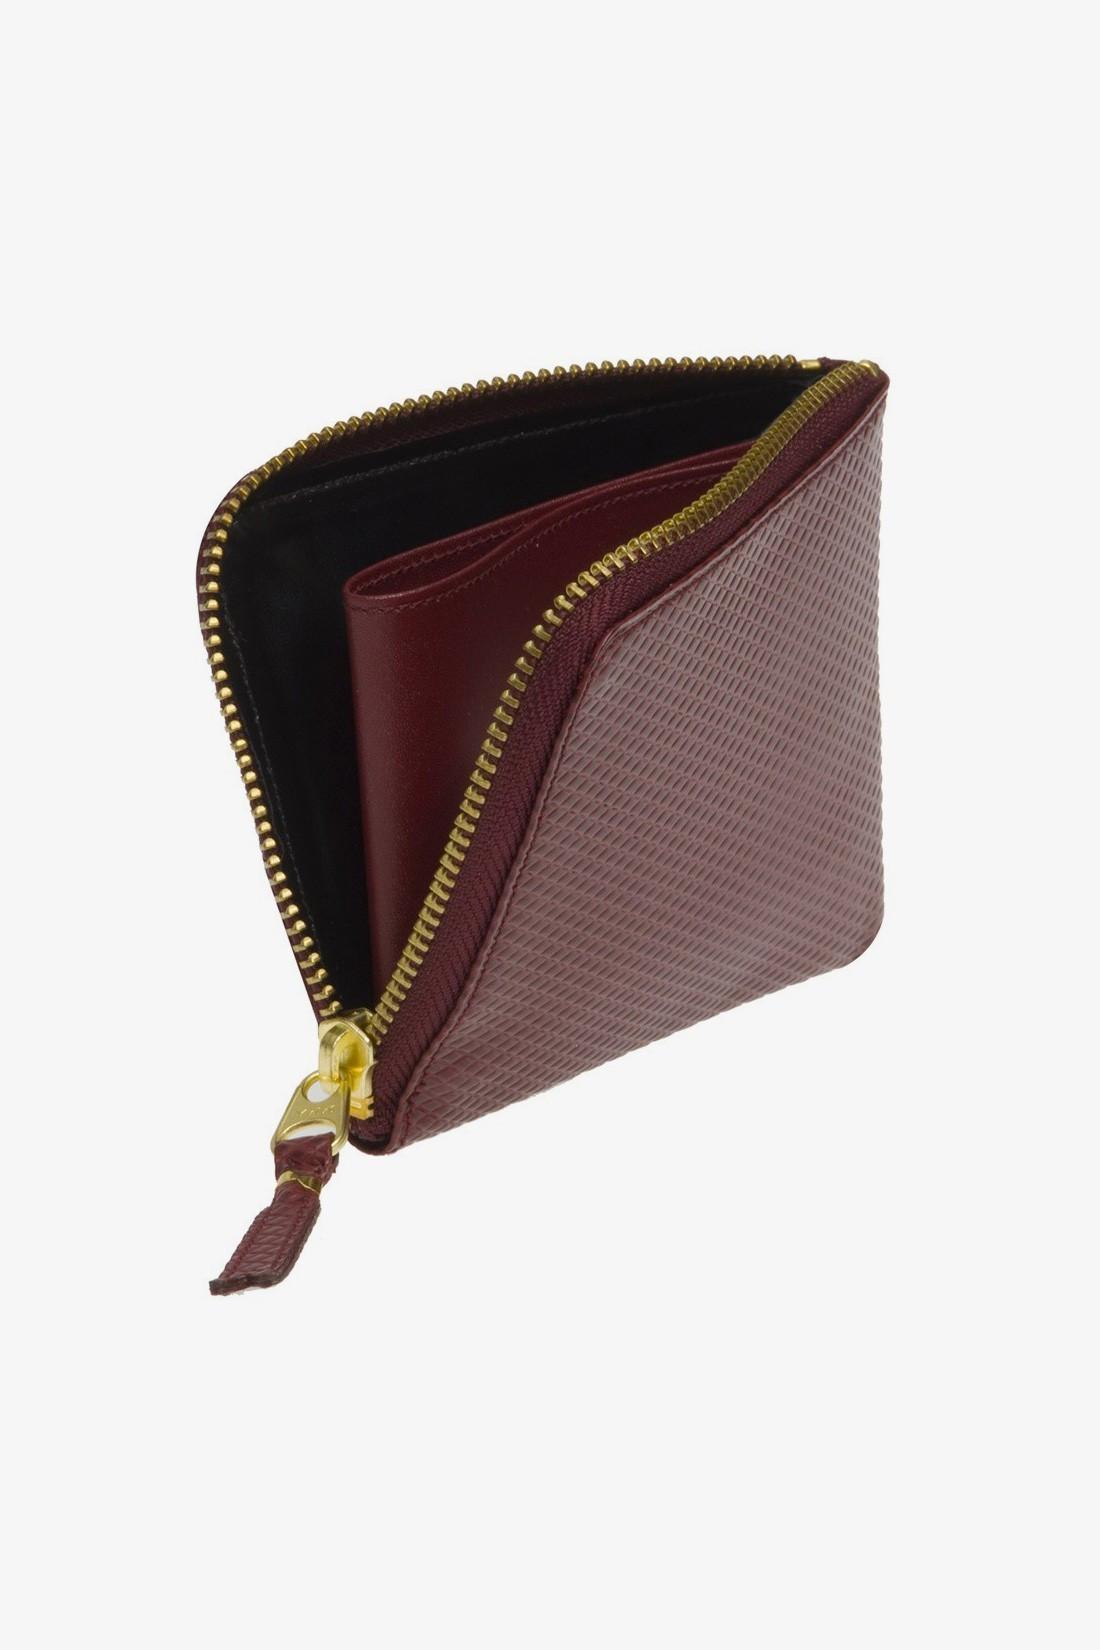 COMME DES GARÇONS WALLETS / Cdg luxury group sa3100lg Burgundy